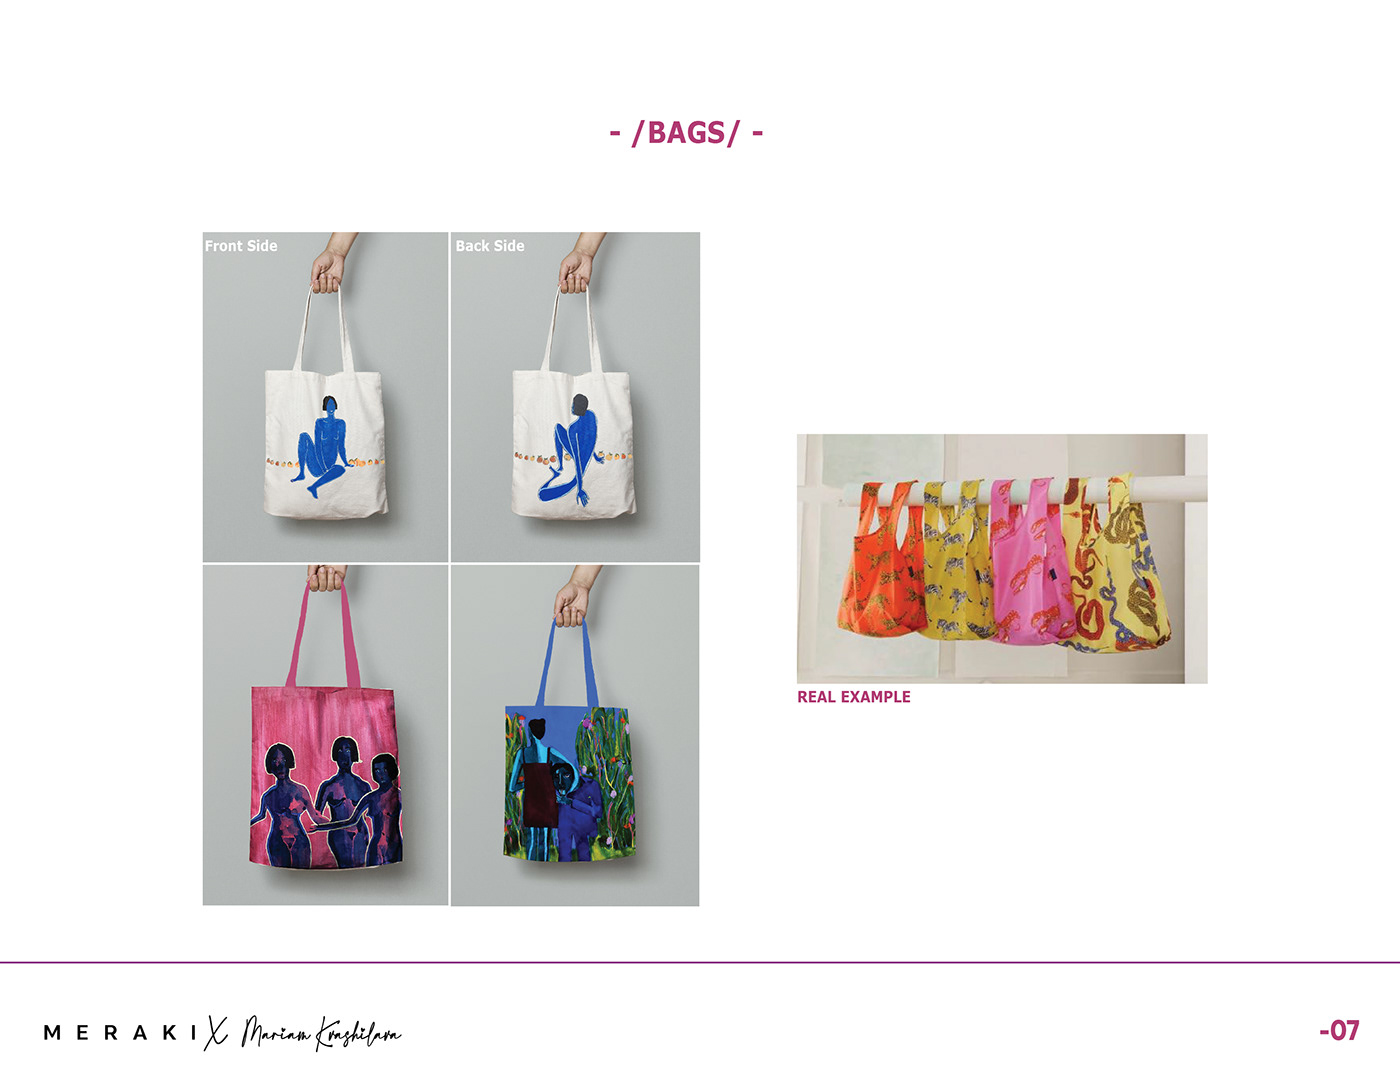 Image may contain: handbag, fashion accessory and gallery